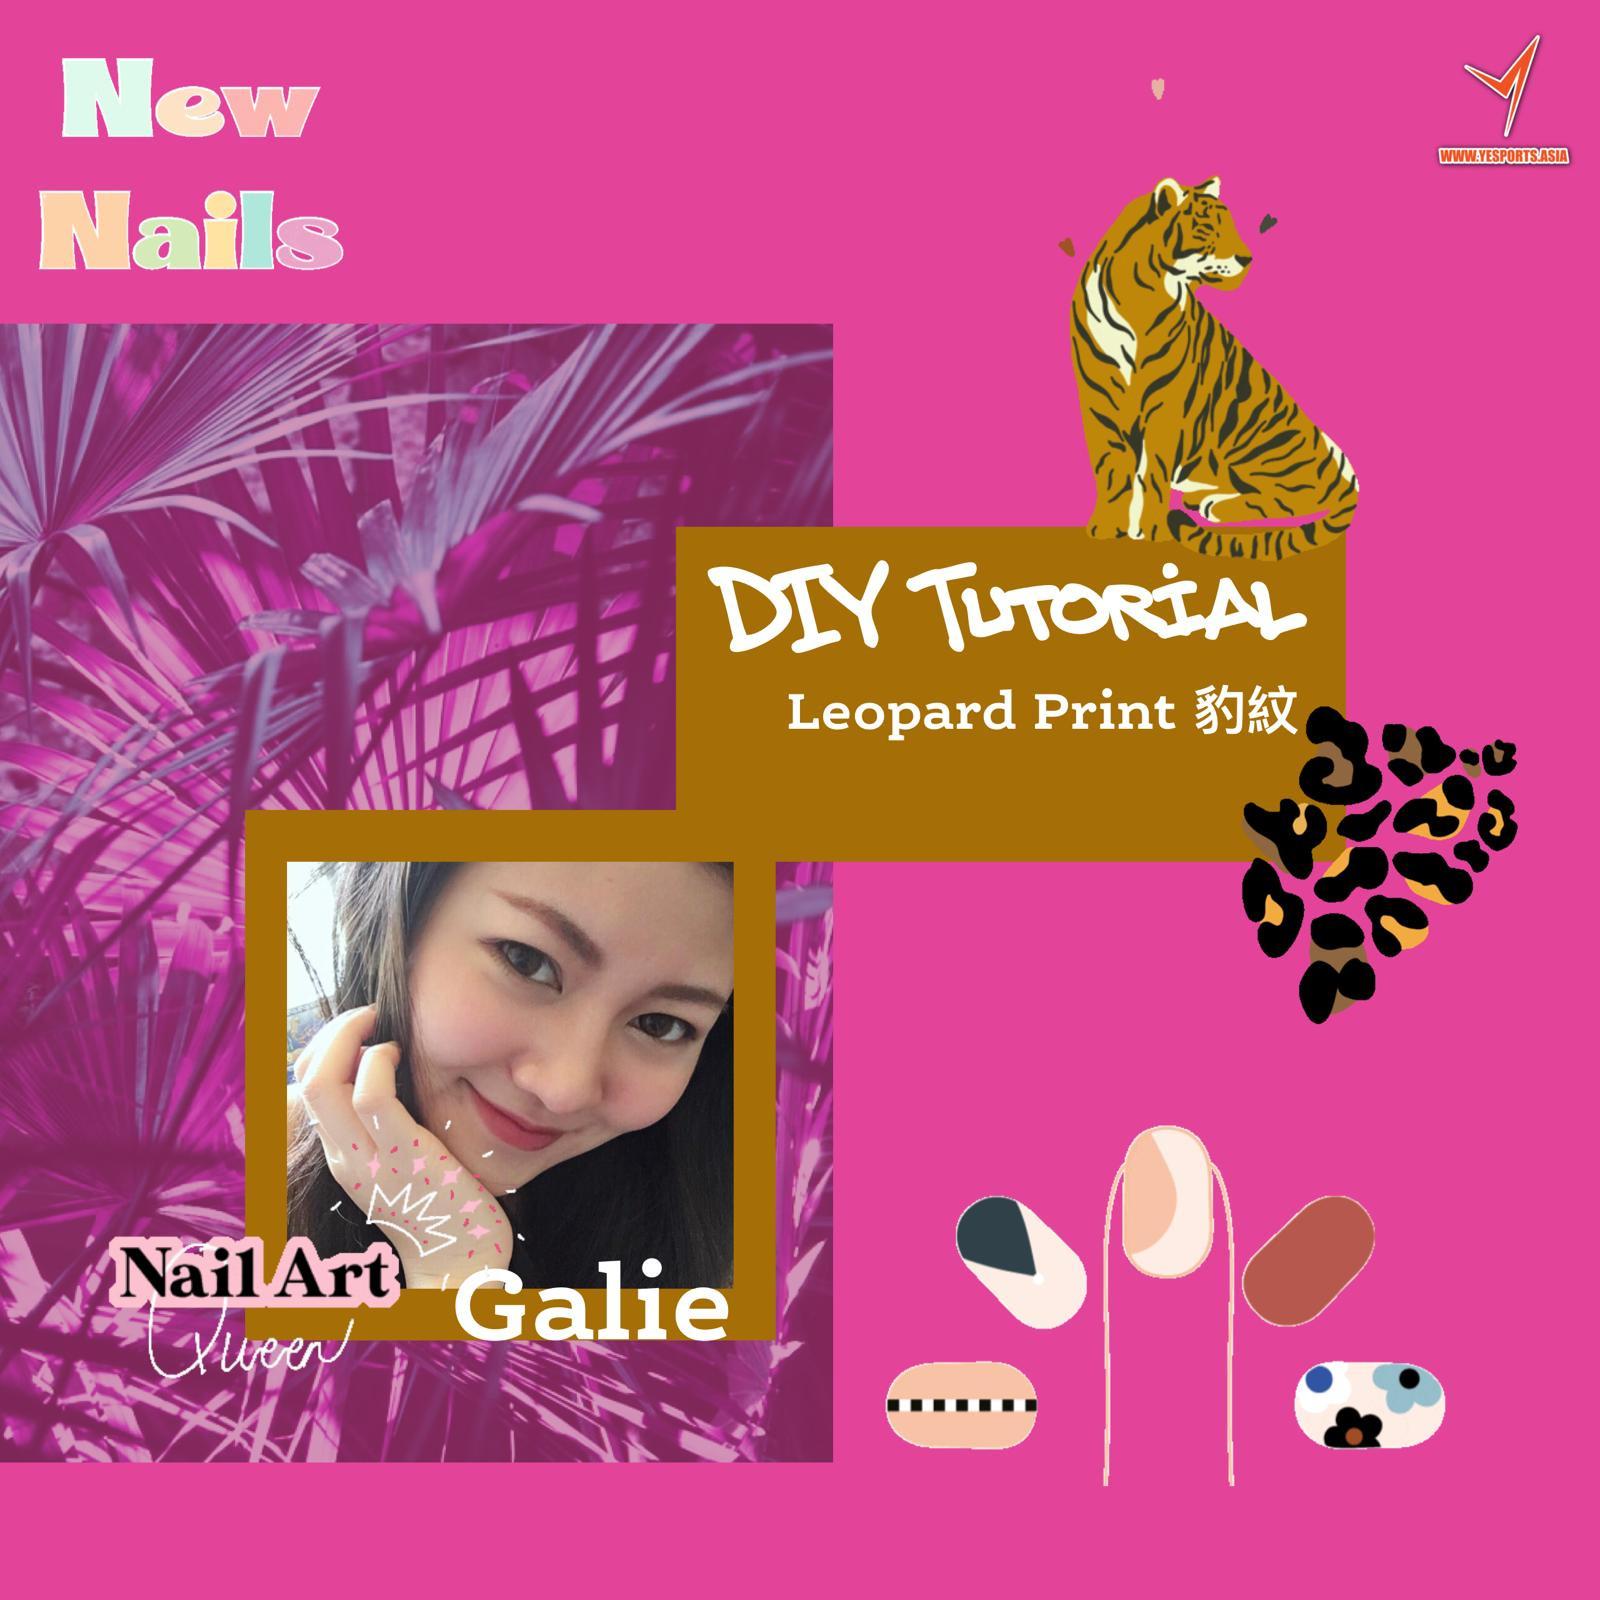 Nail Art - DIY leopard print nails